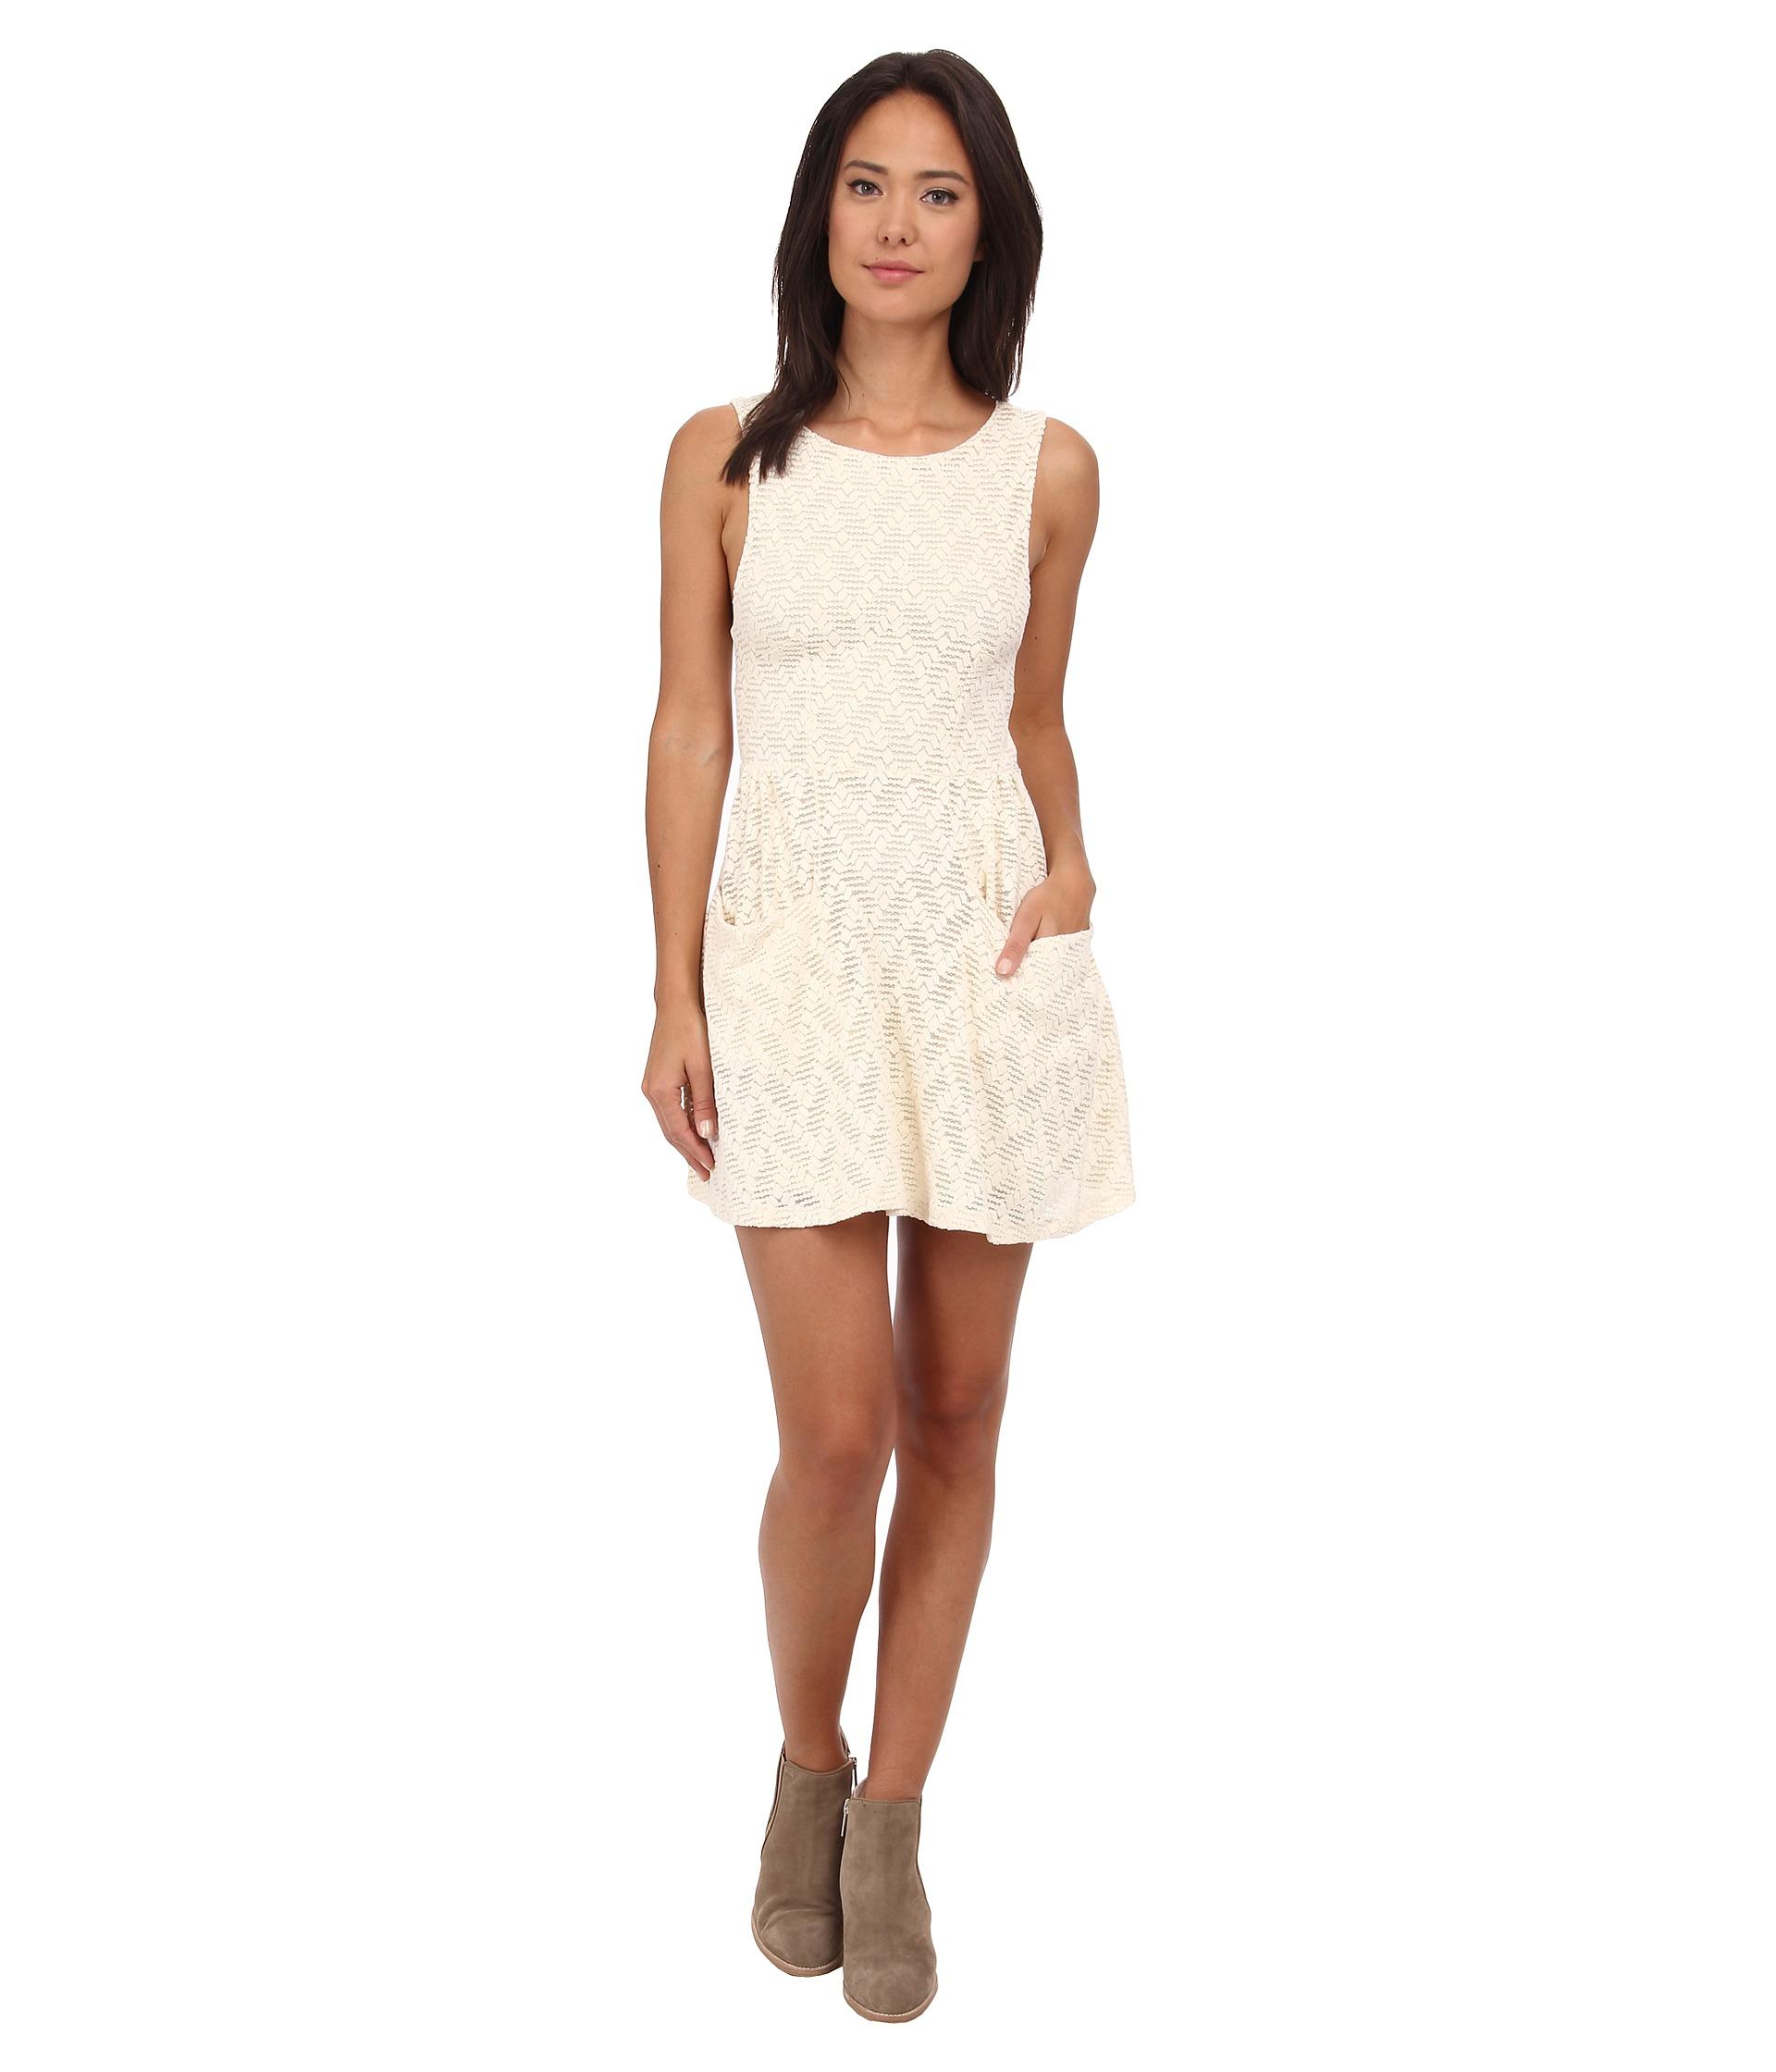 4e65f51da1e4 Lyst - Free People Textured Lace Poppy Mini Knit Dress in Natural